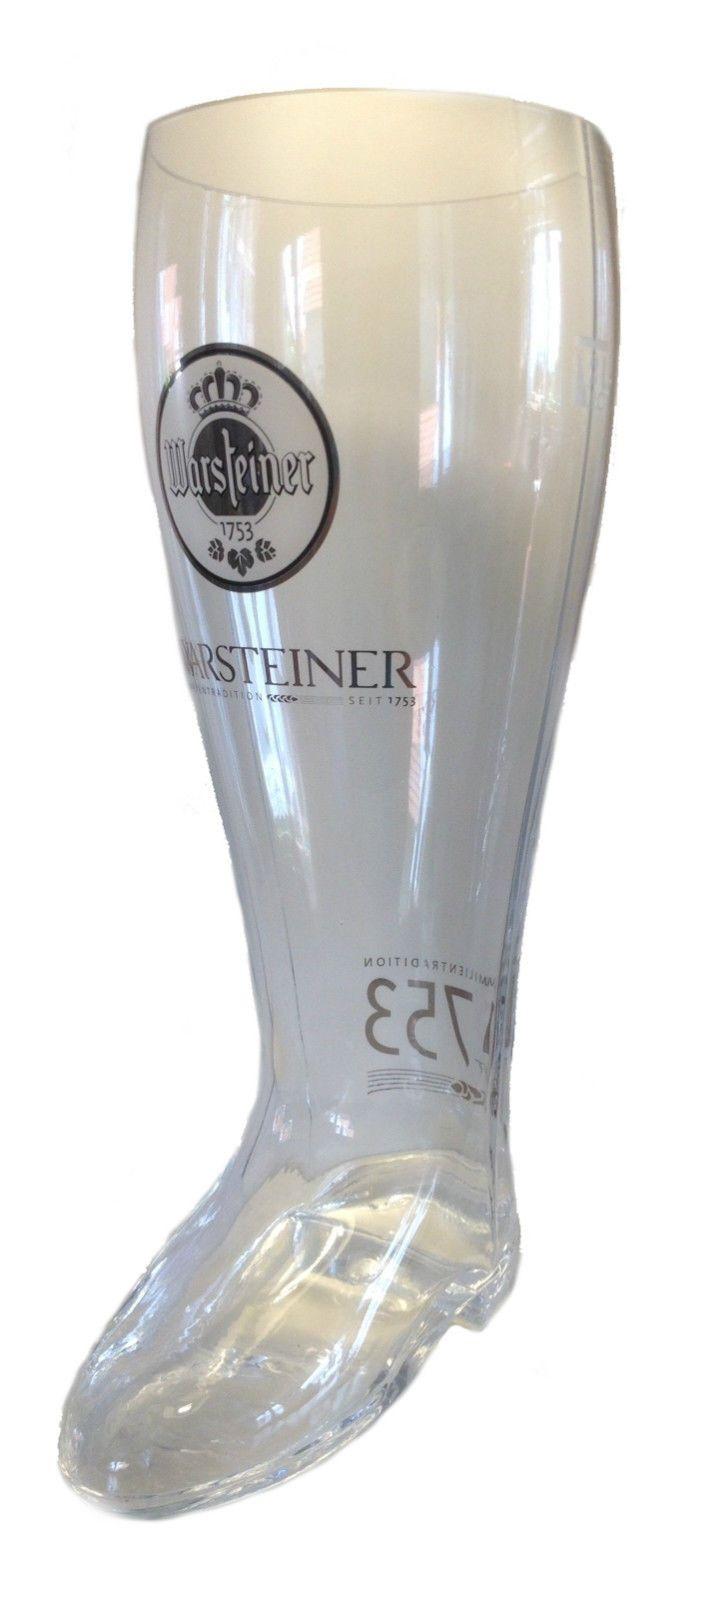 Warsteiner - 2 liter - german beer glass boot -